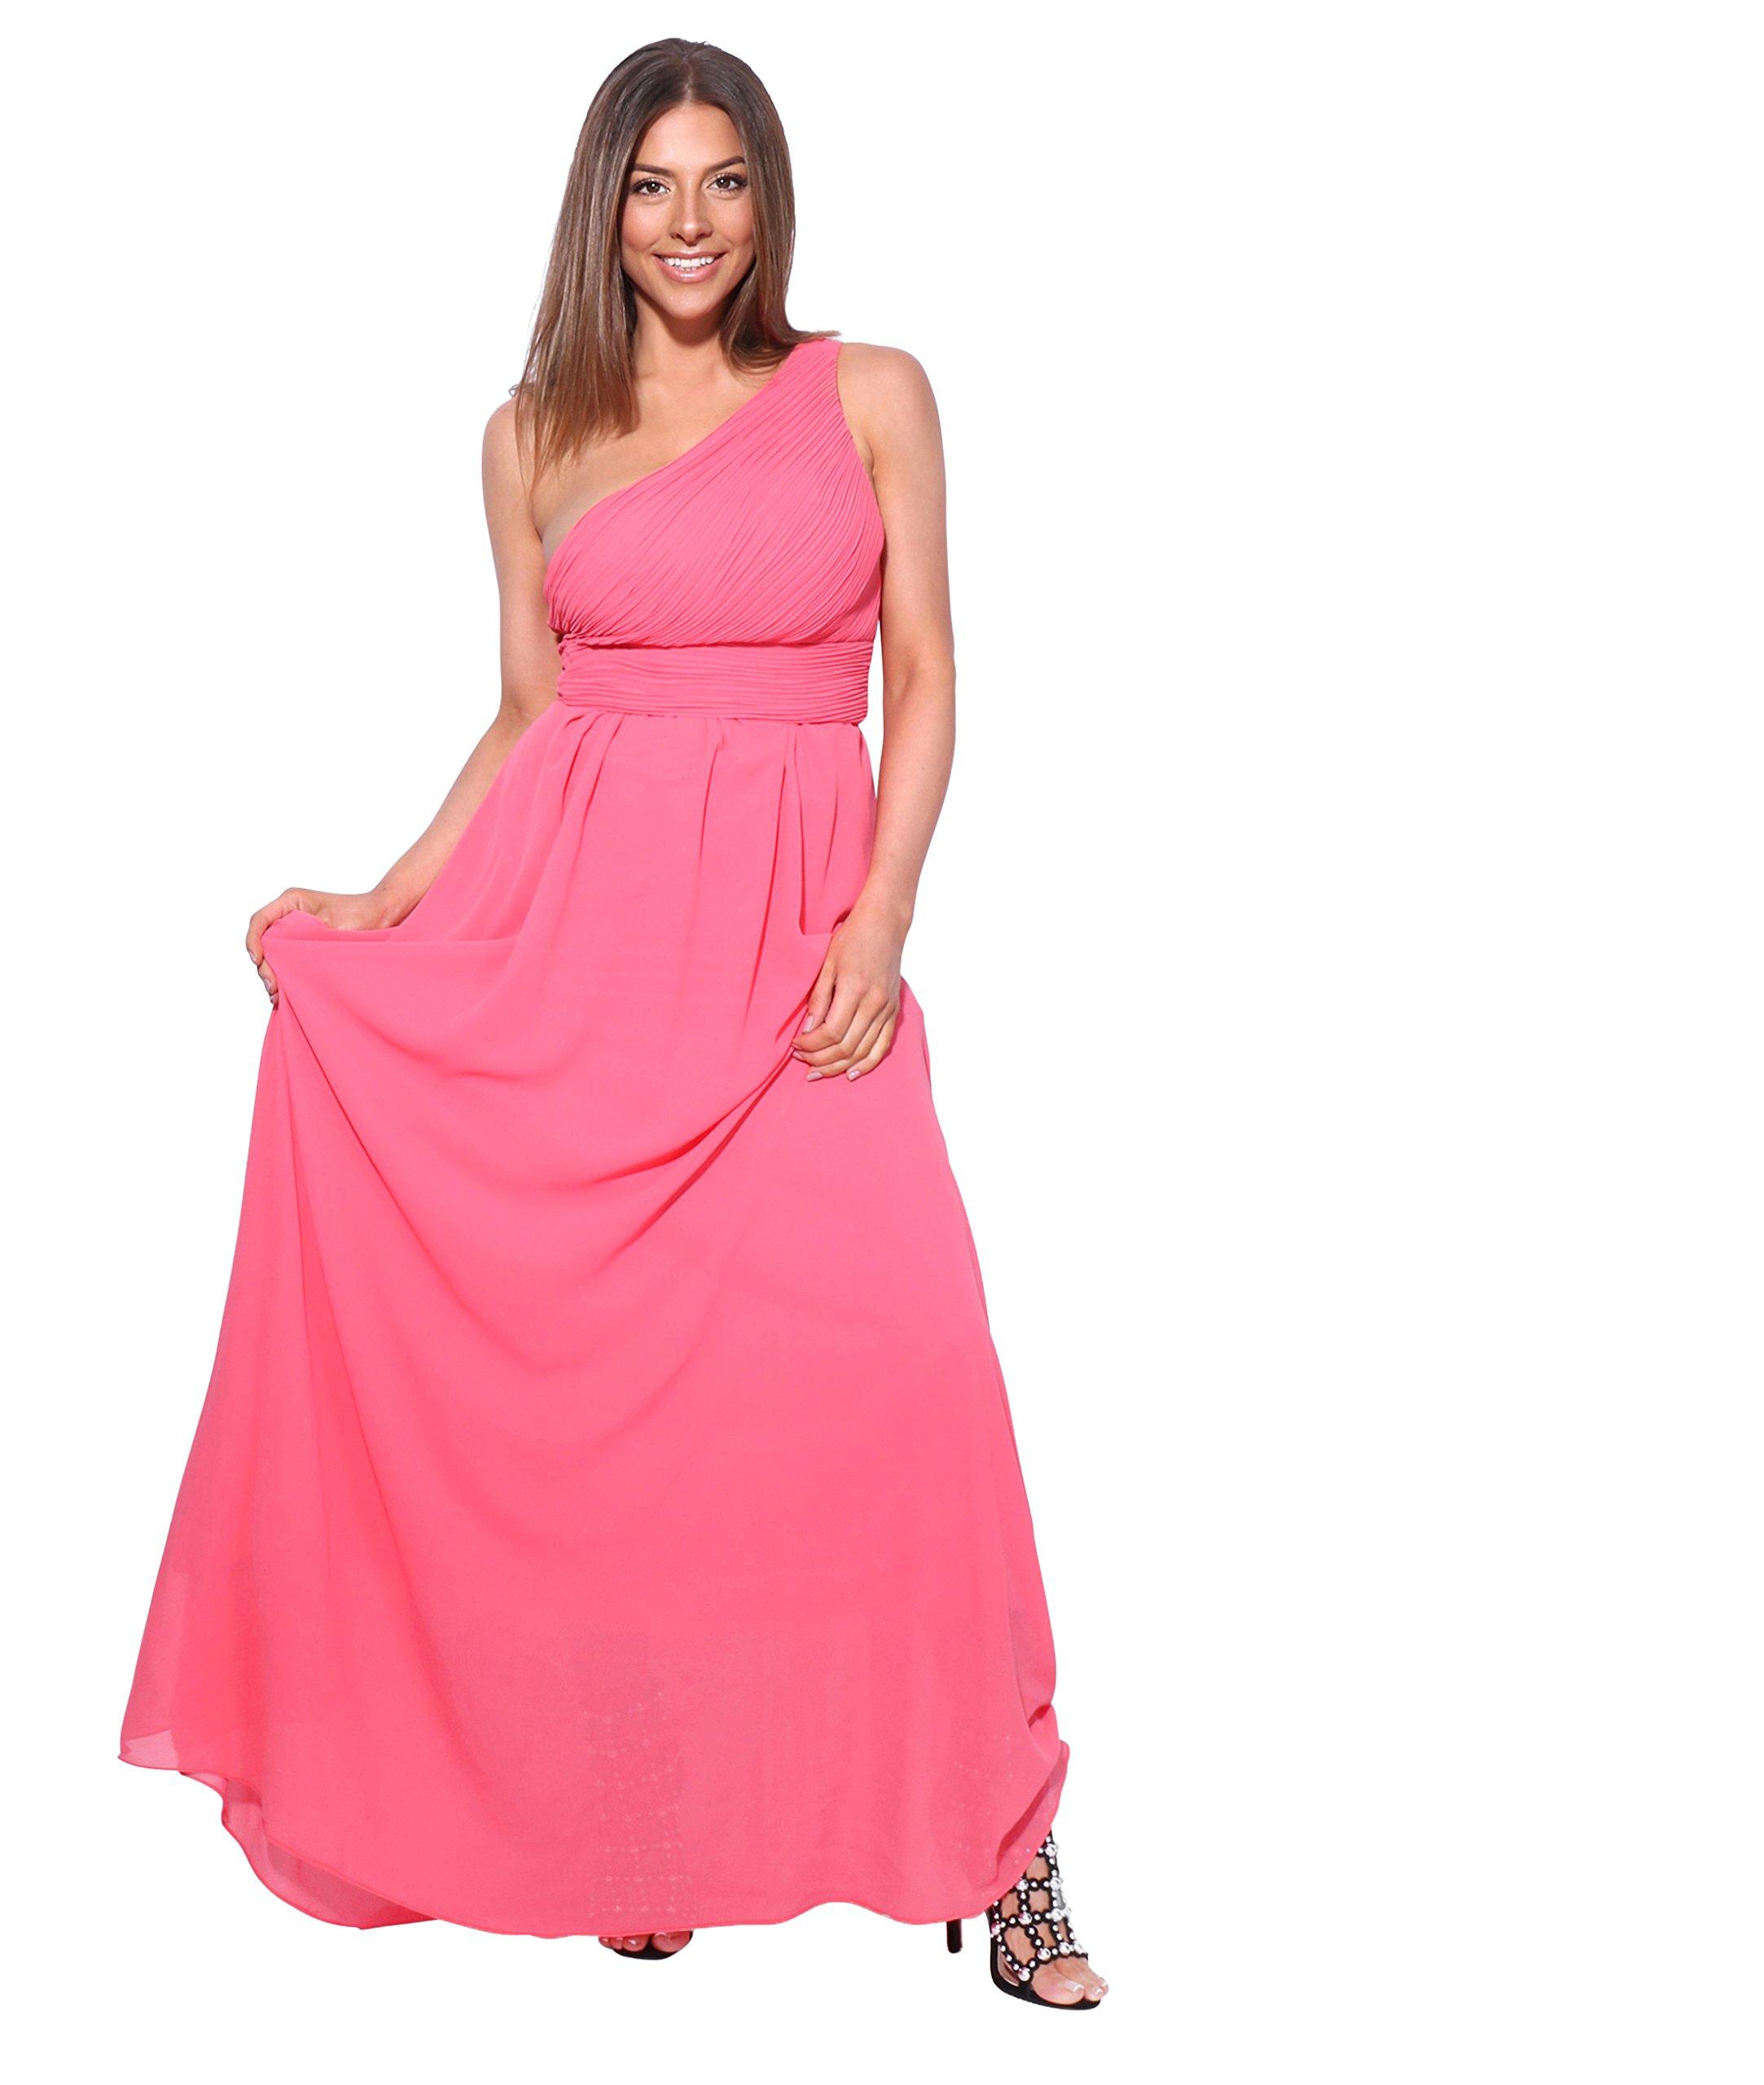 KRISP Womens Prom Maxi Dress Wedding Bridesmaid Evening Cocktail Dresses Plus Size